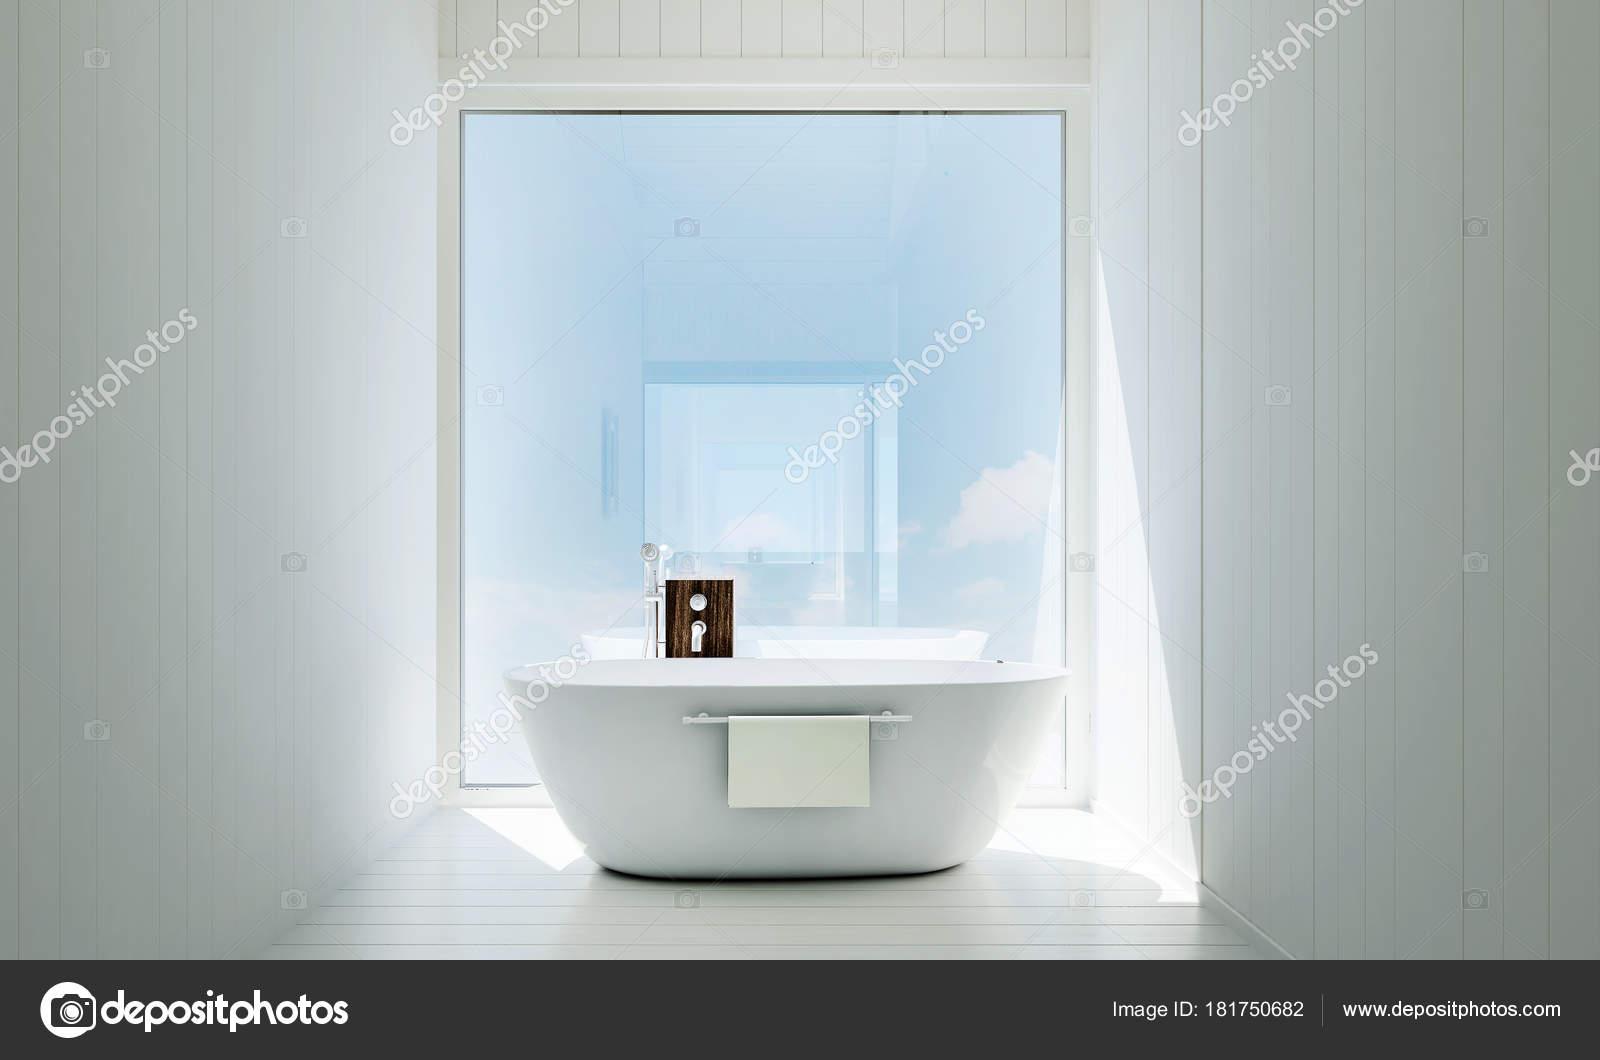 Luxury Bathroom Jacuzzi Interiors Design Idea Concept White Texture Wall Stock Photo